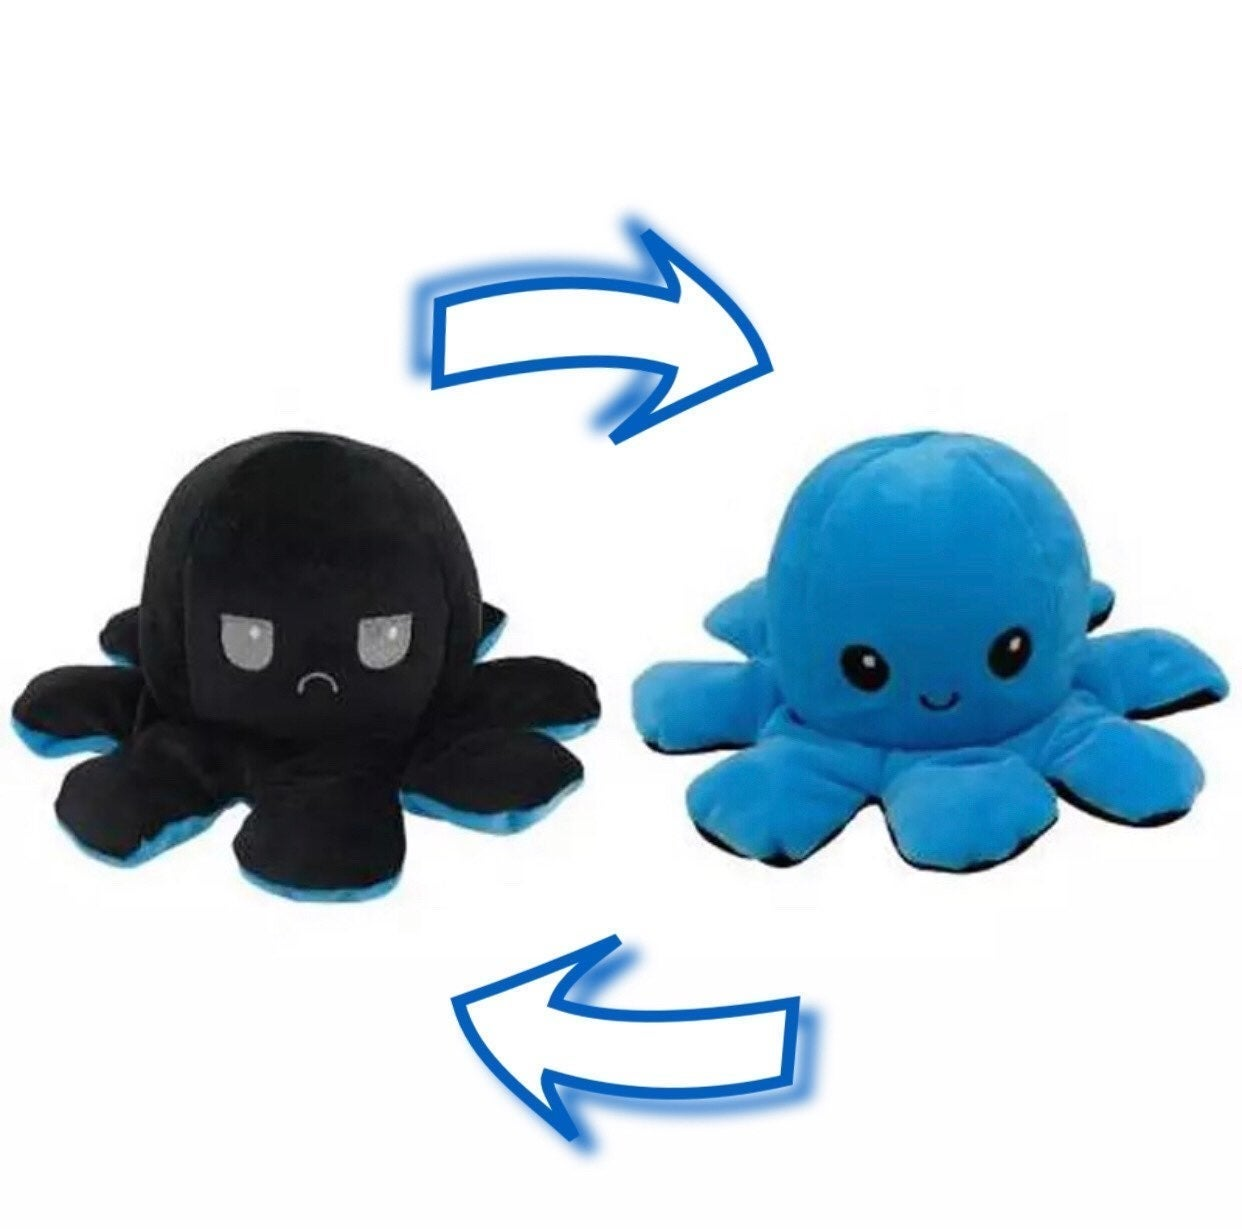 2 in 1 blue reversible octopus